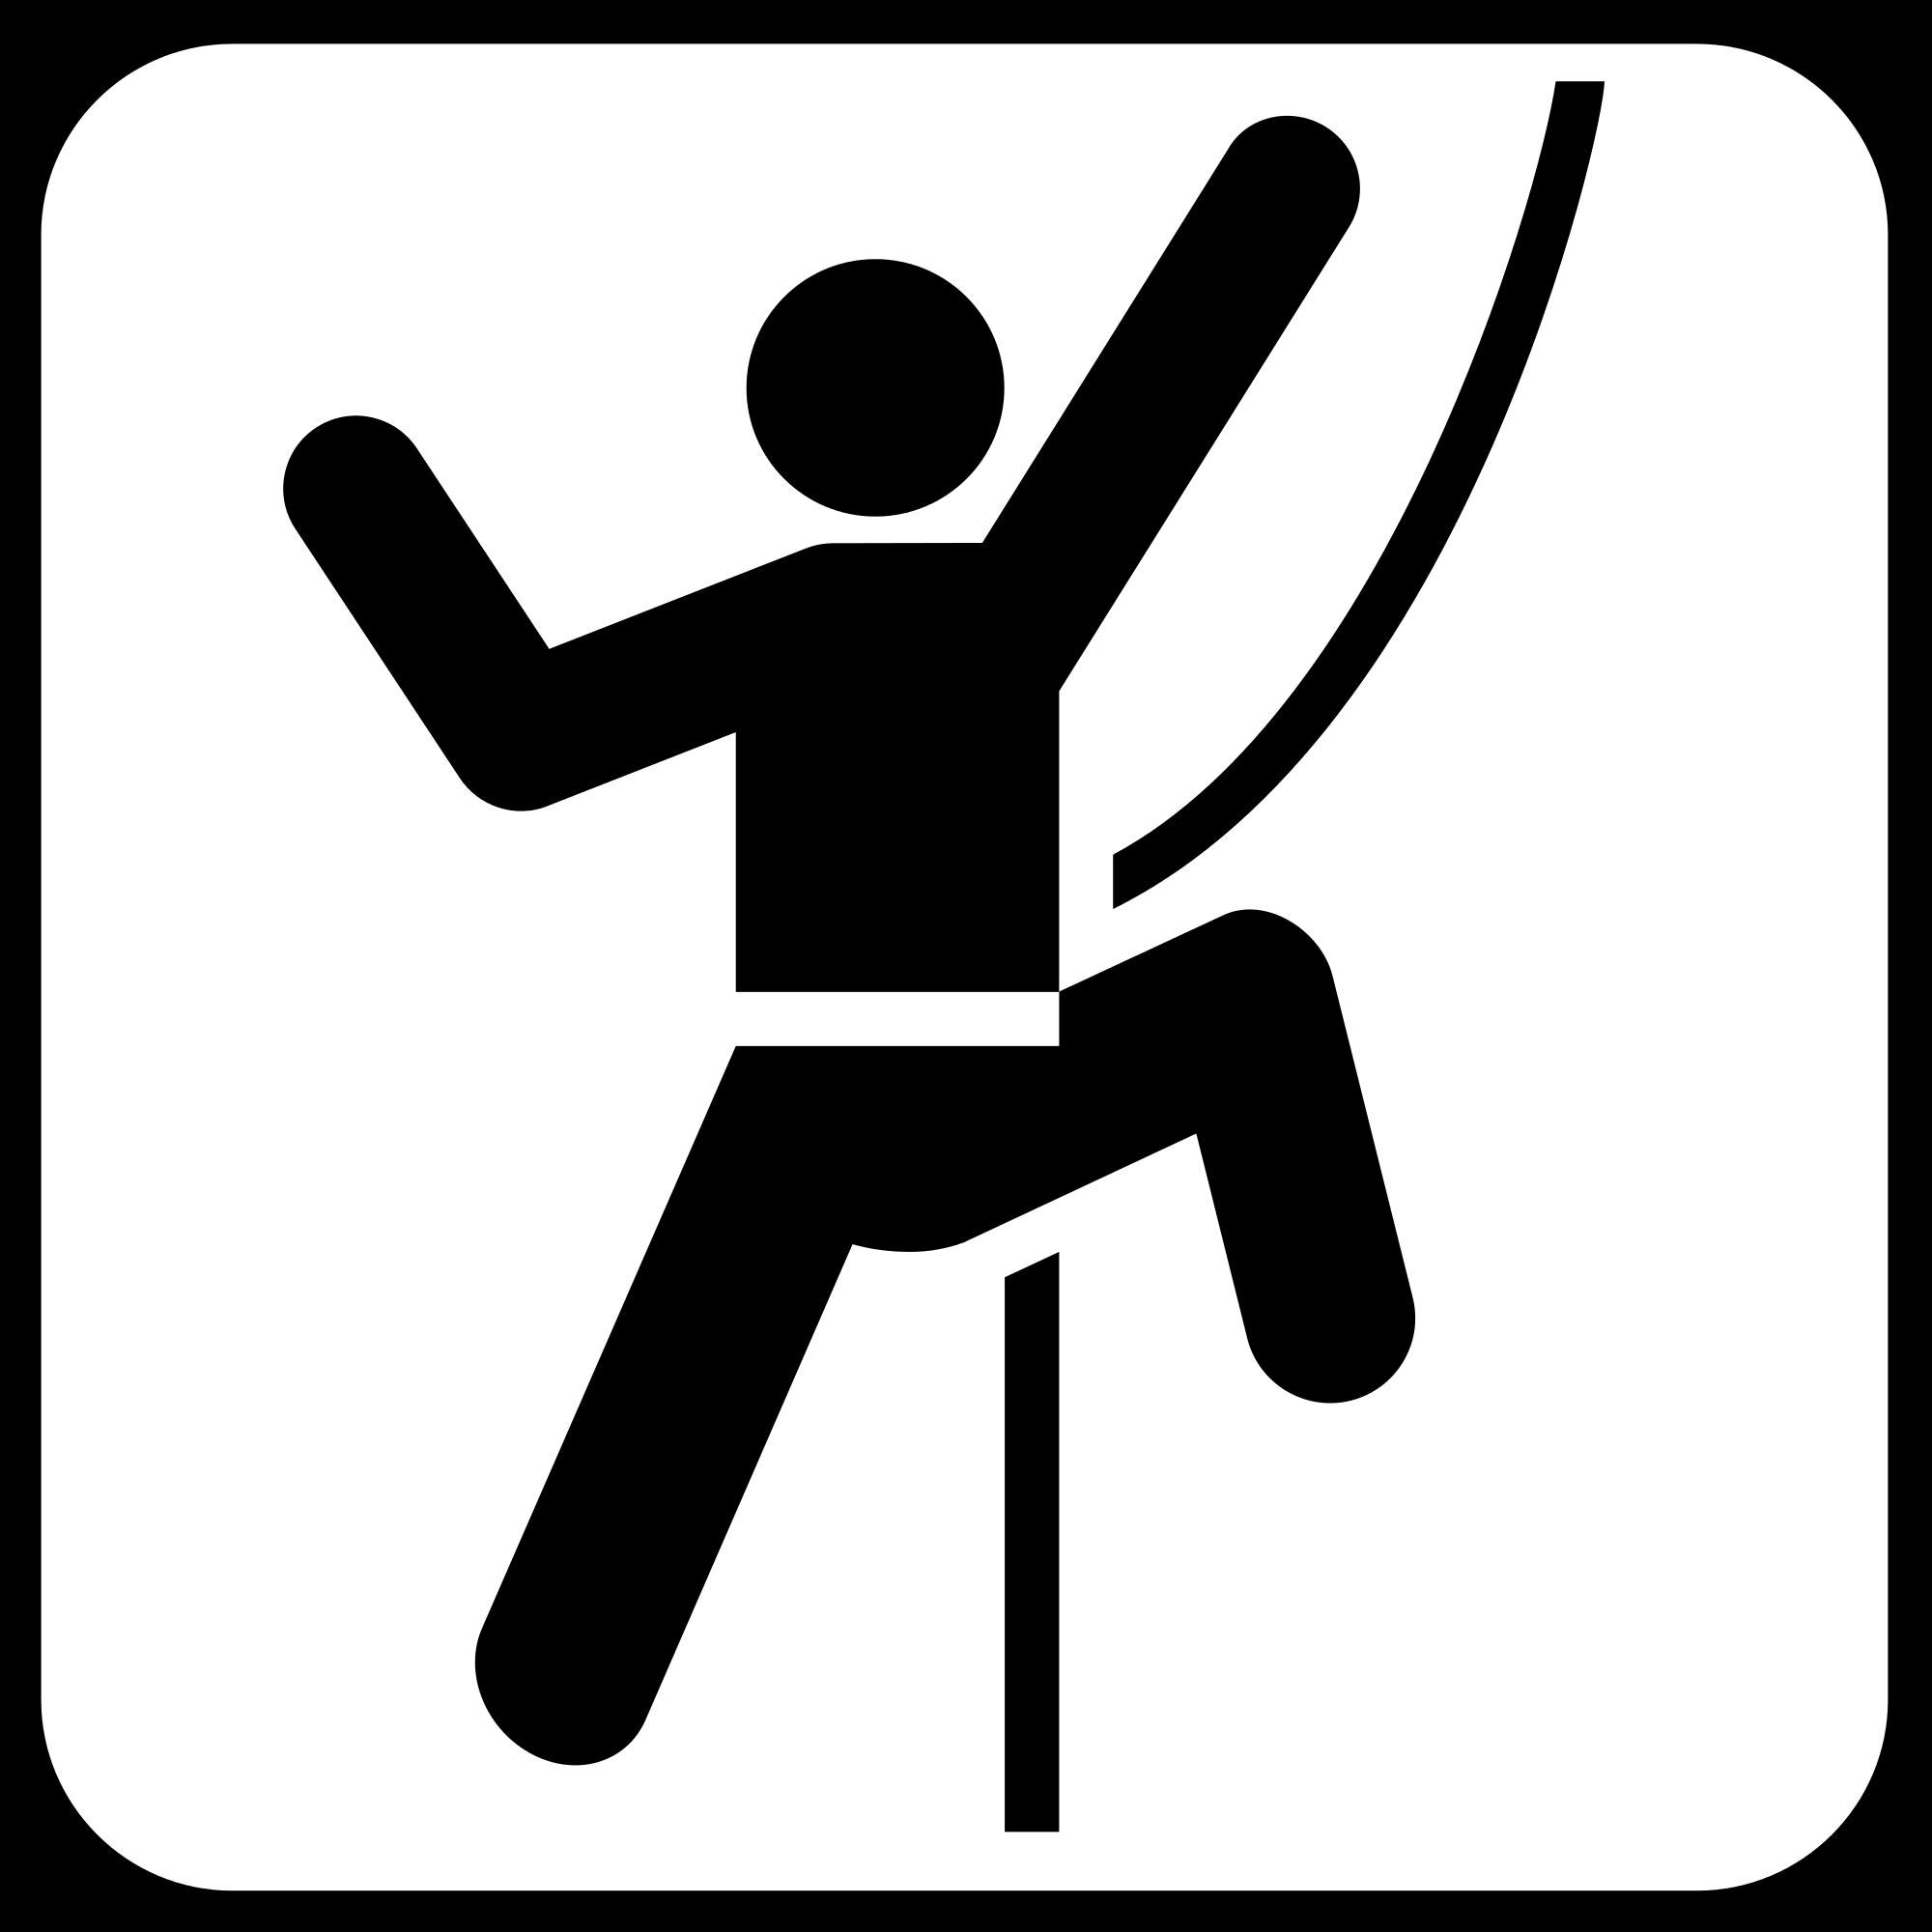 2000pxPictogramsnpslandtechnical_rock_climbing.svg.png